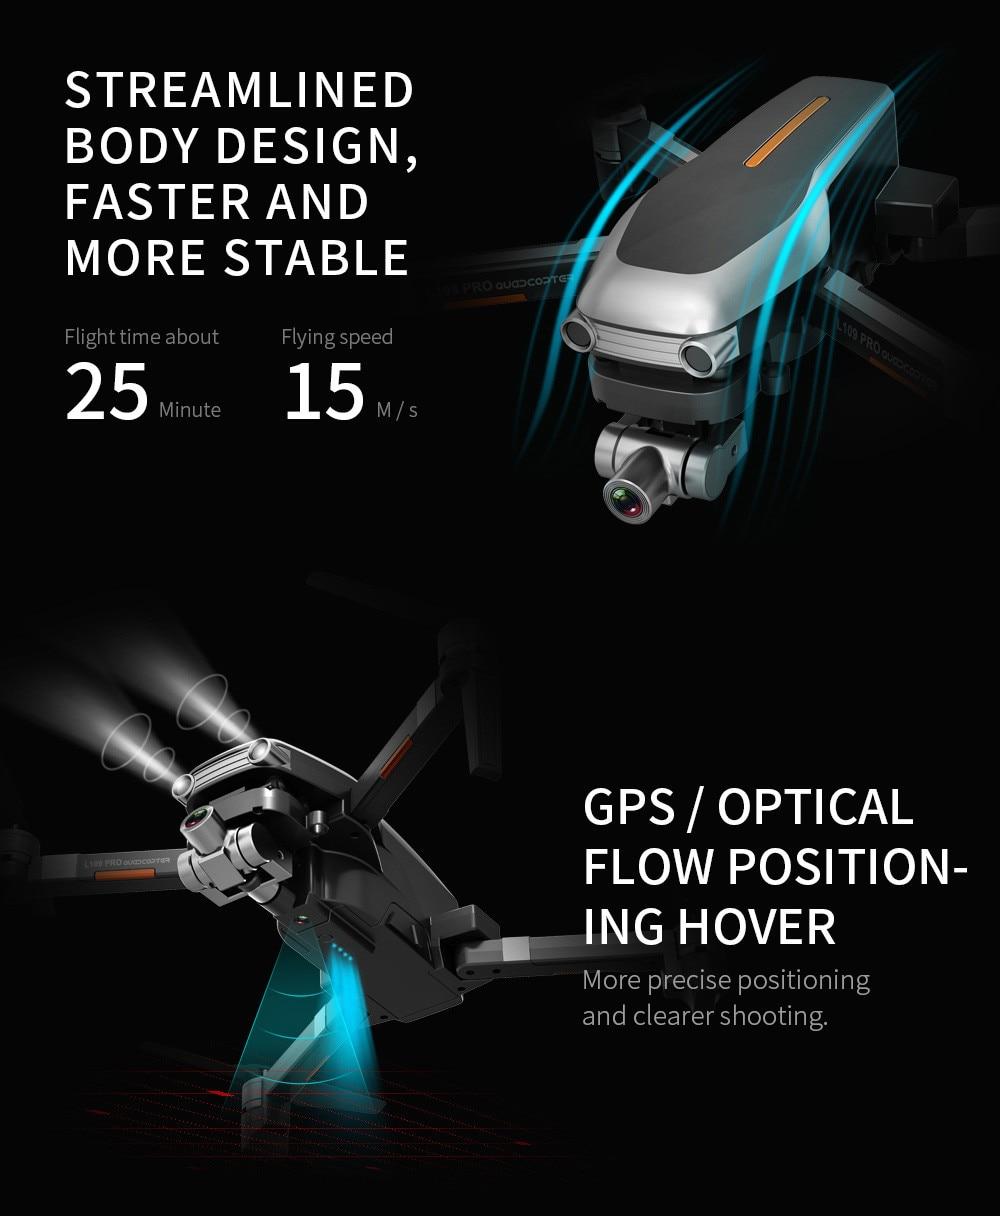 Advertisement - L109PRO GPS Drone 4K Quadcopter HD ESC Camera Brushless 5G WiFi FPV HD ESC Camera Brushless Helicopter Long Flight Time